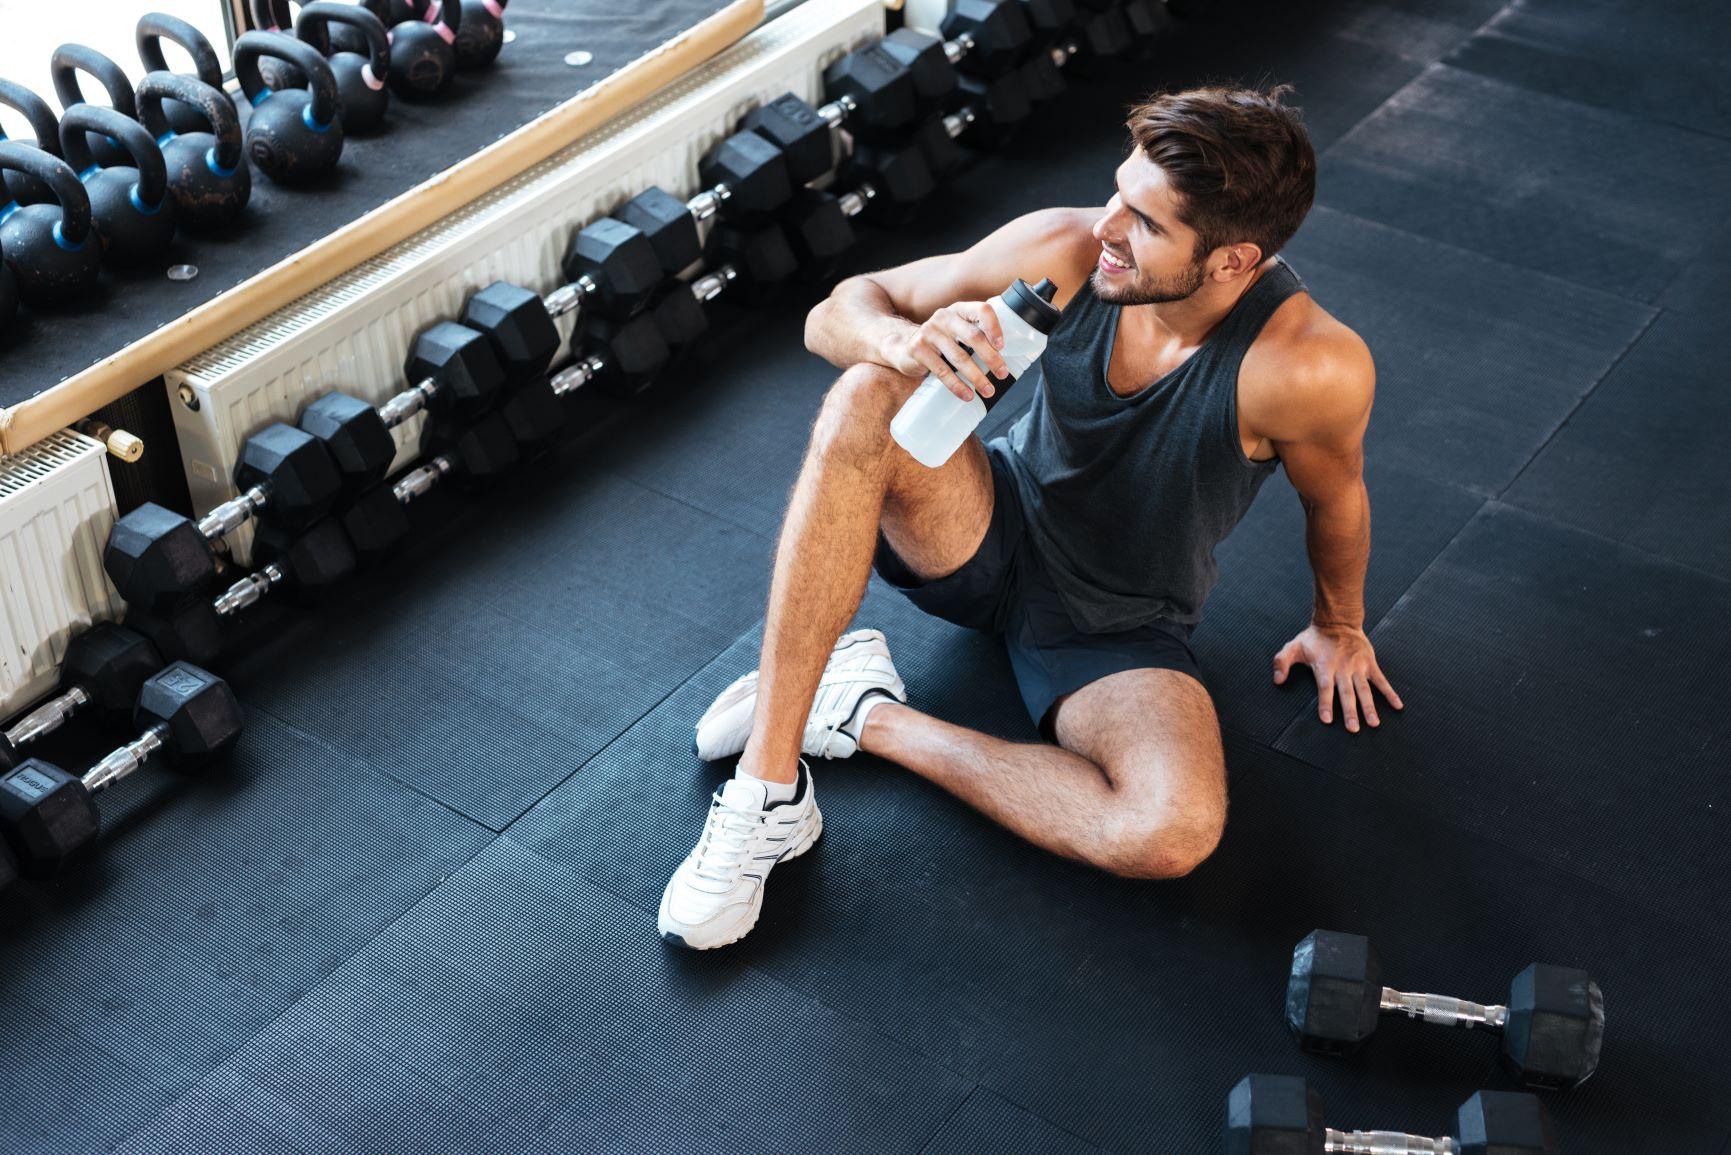 gym near me - O'Fallon gym in your area